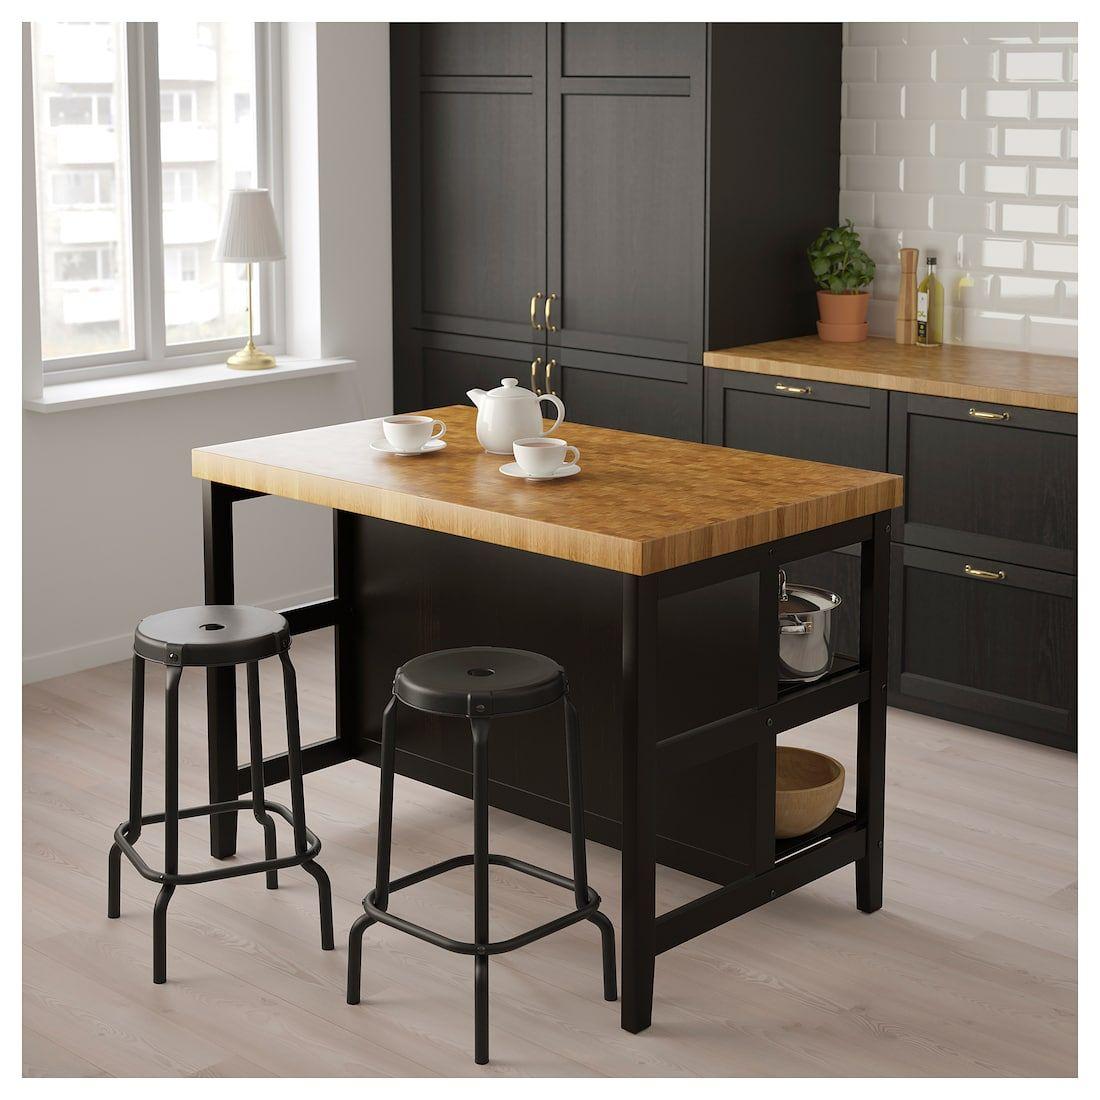 VADHOLMA Kitchen island   black, oak   IKEA   Freestanding kitchen ...